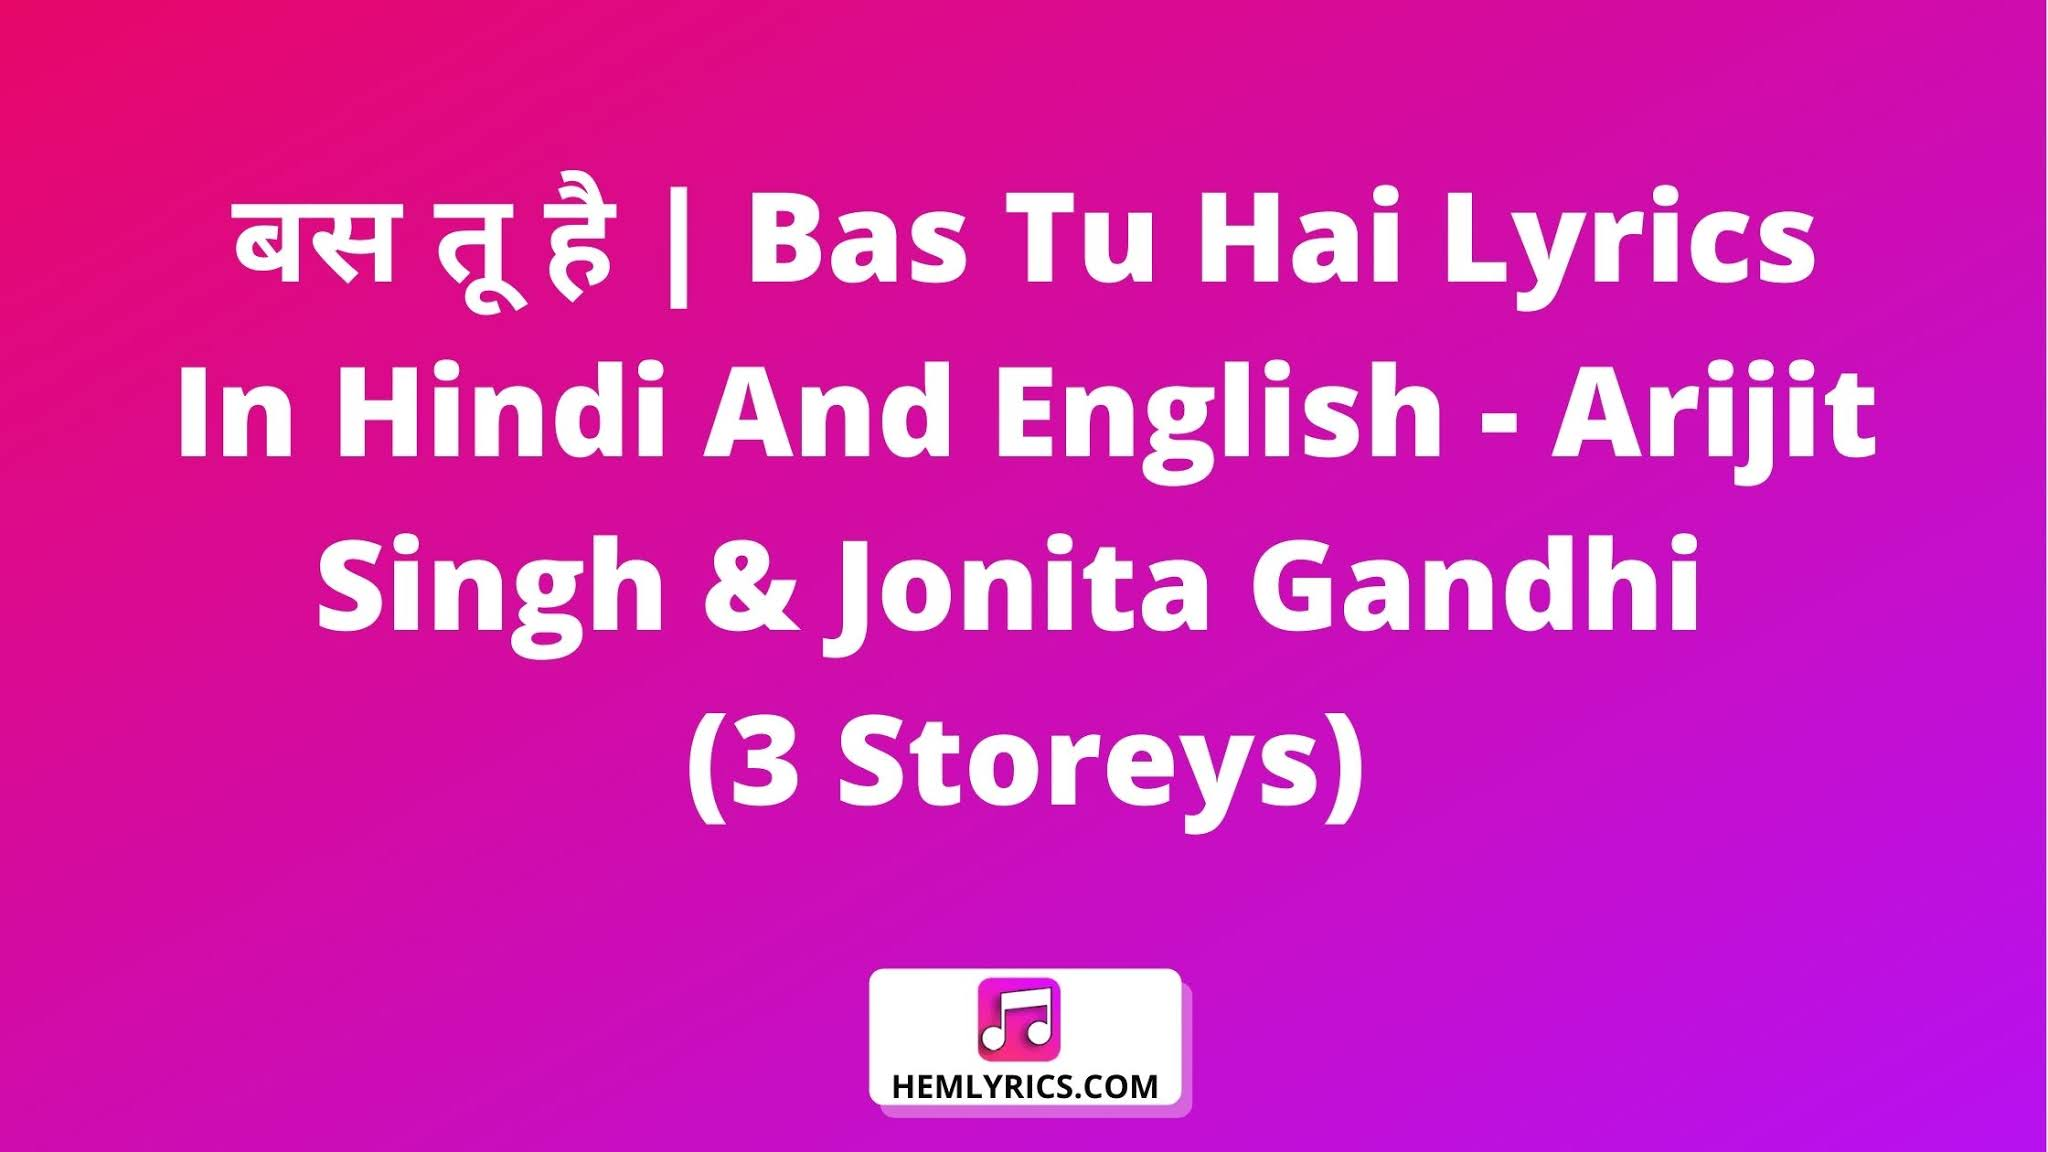 बस तू है | Bas Tu Hai Lyrics In Hindi And English - Arijit Singh & Jonita Gandhi (3 Storeys)